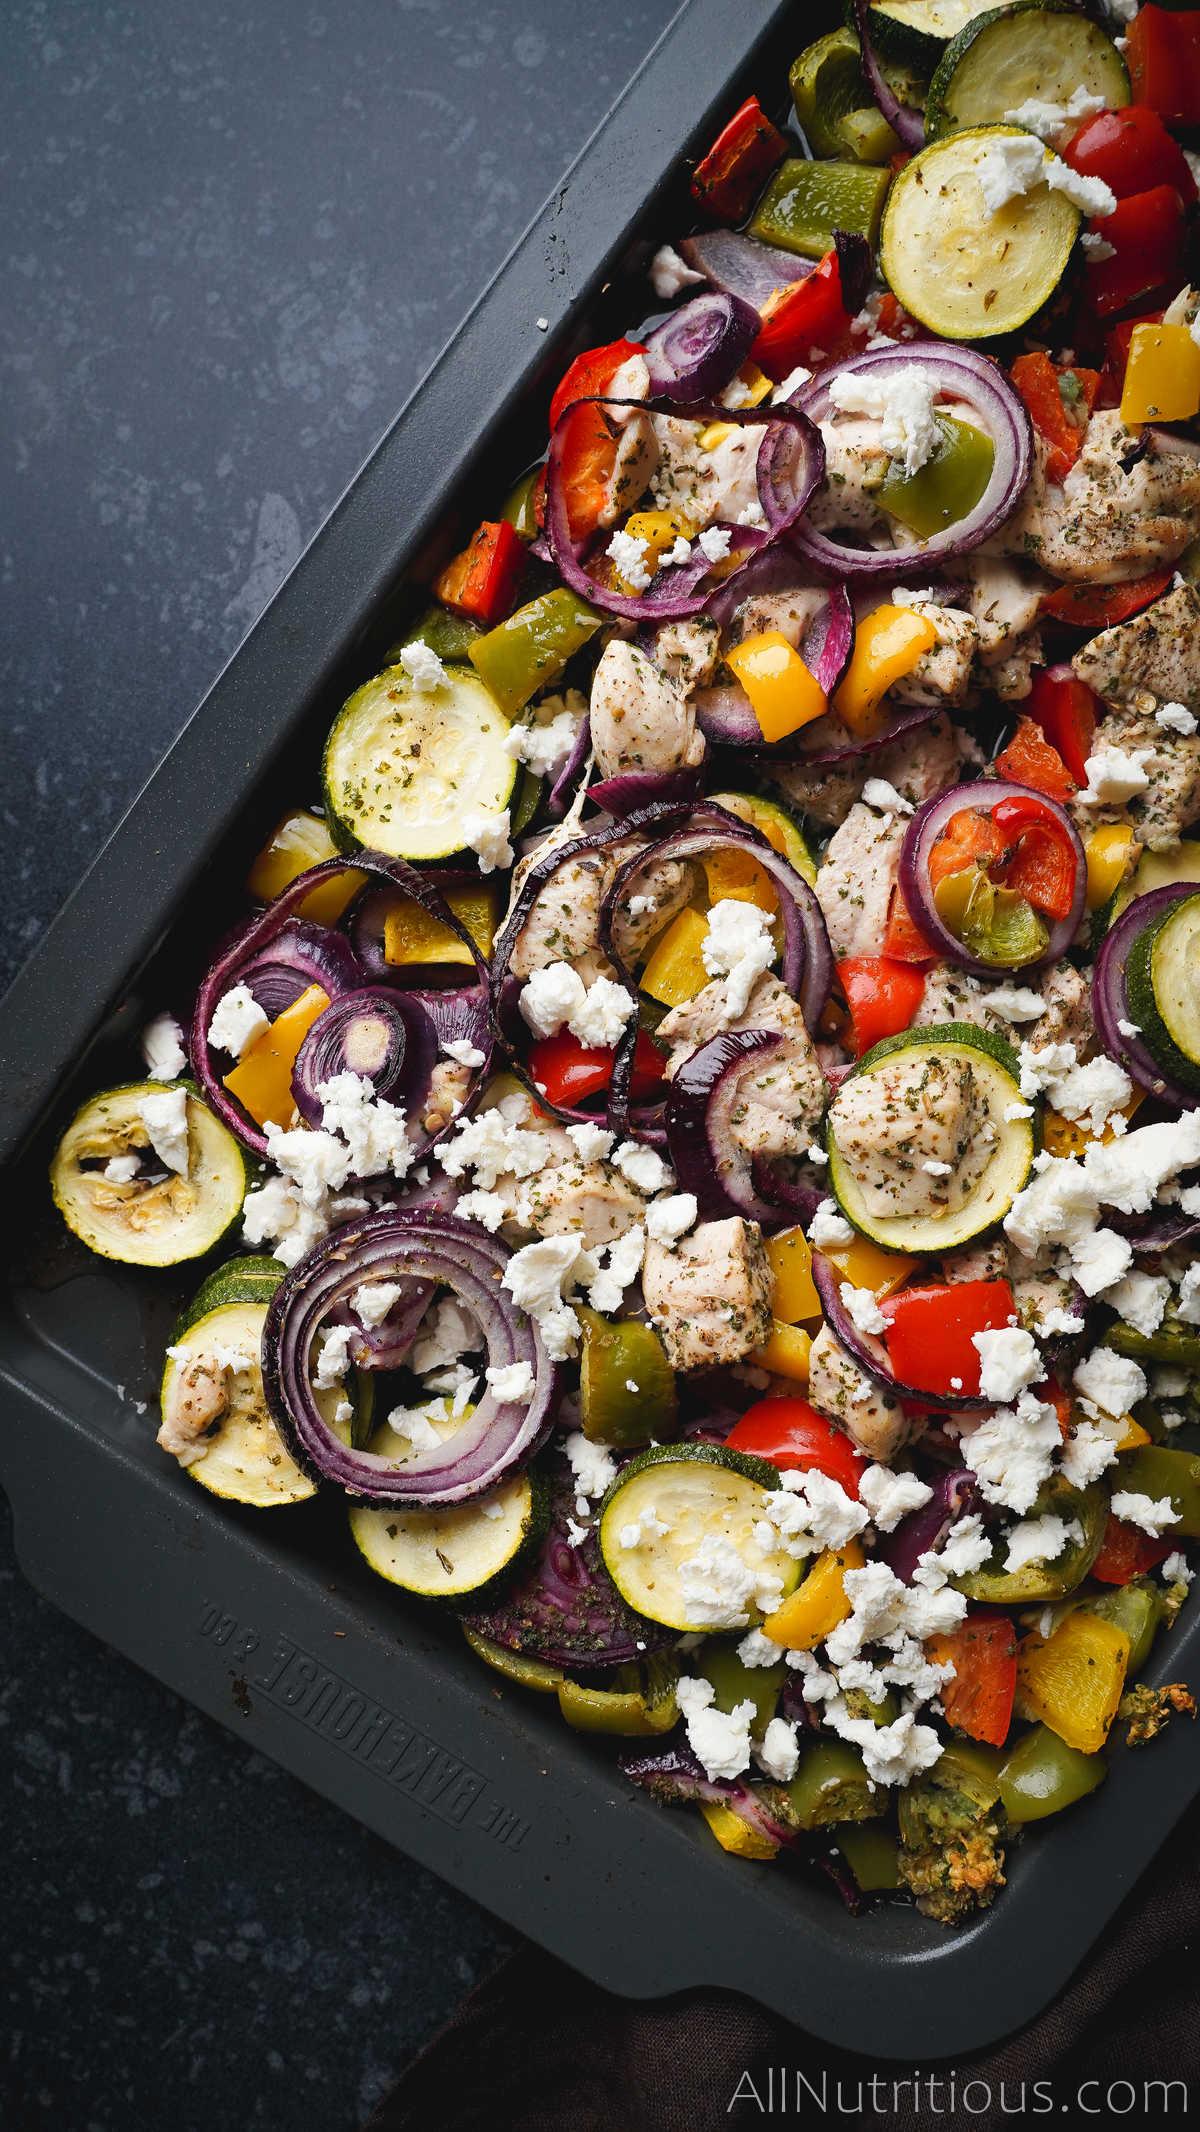 cooked sheet pan with veggies